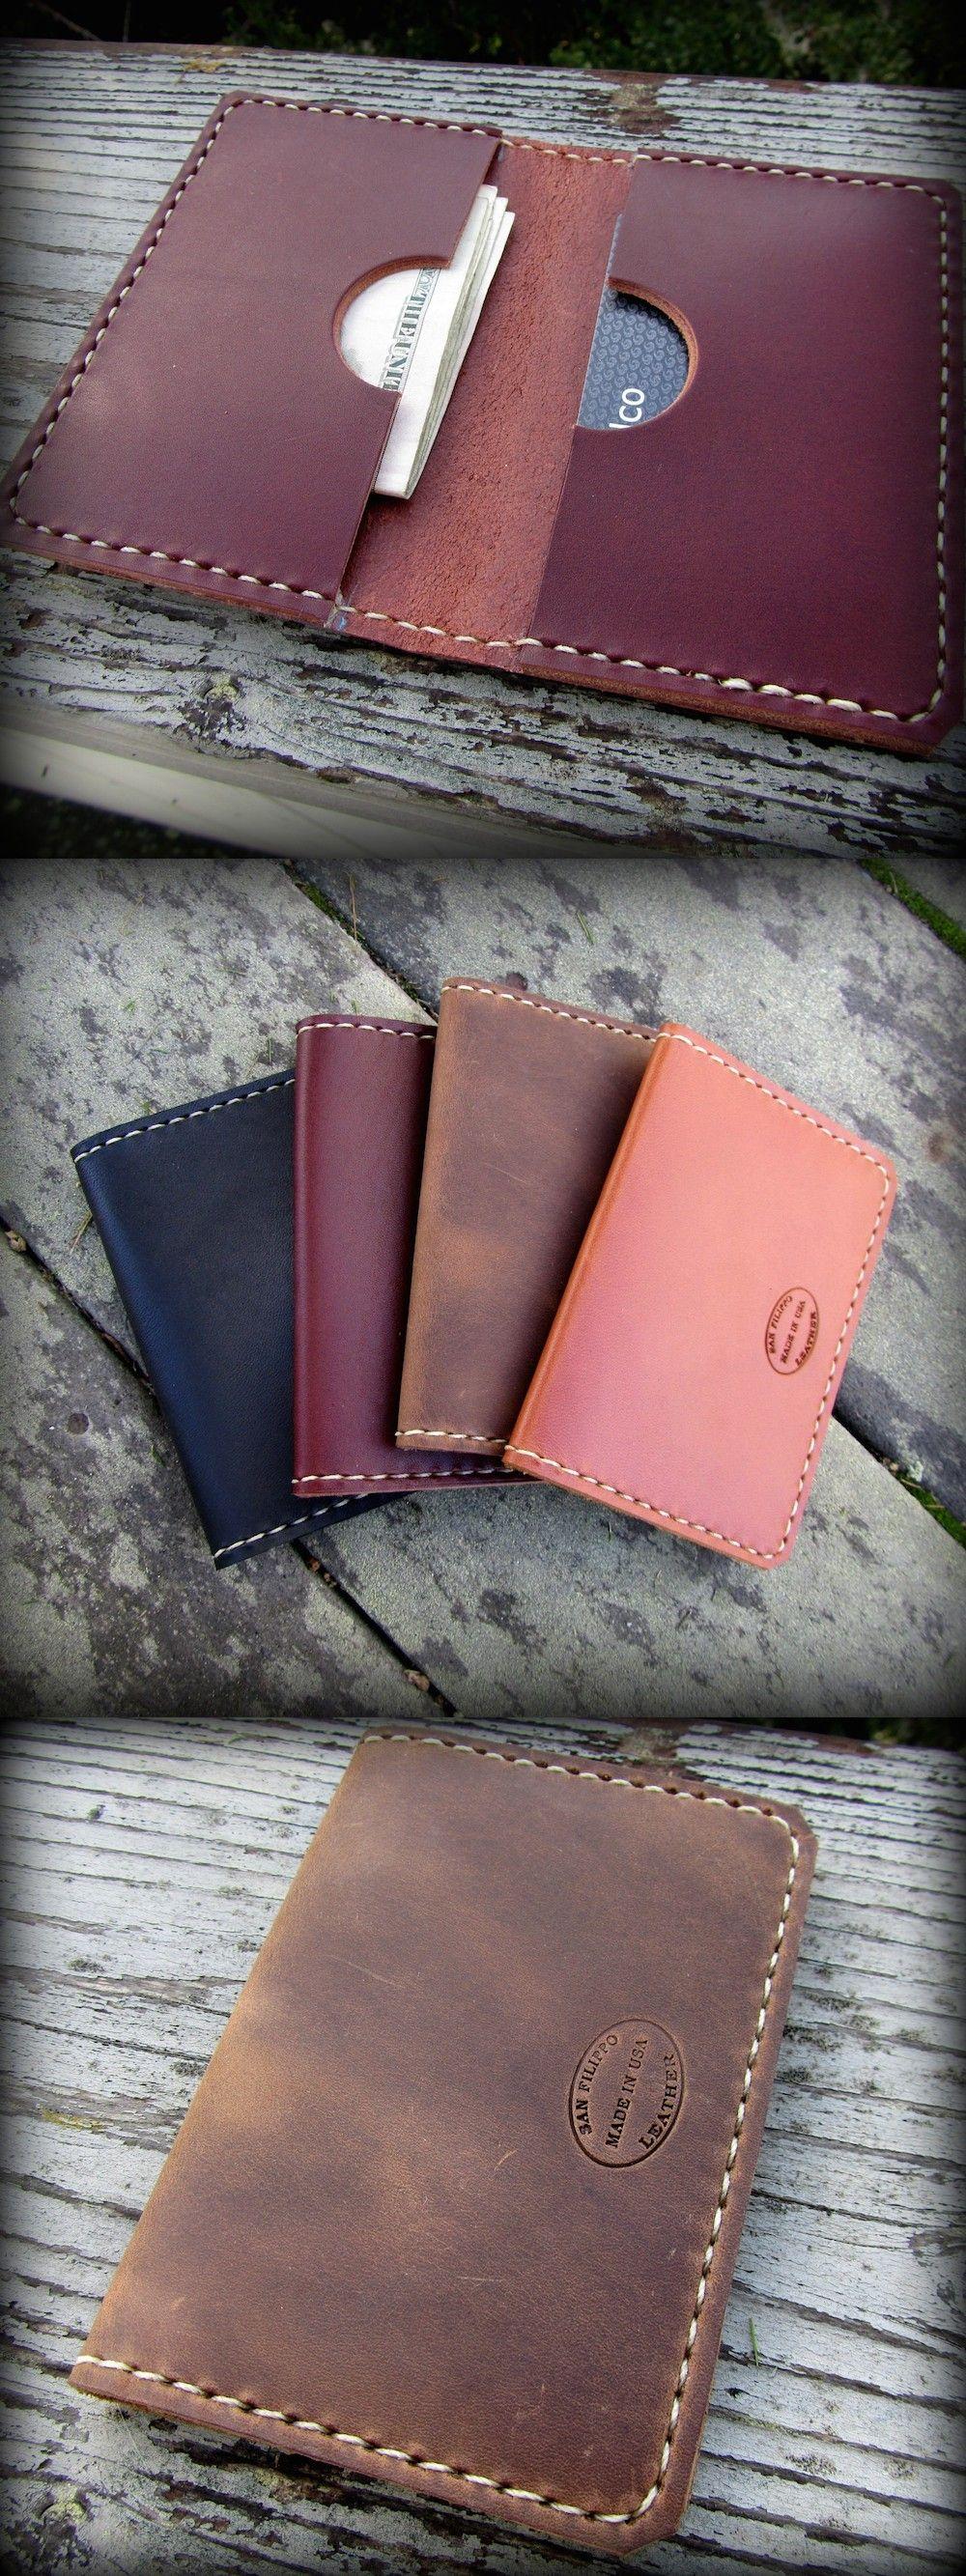 Double Card Wallet #leatherwallets